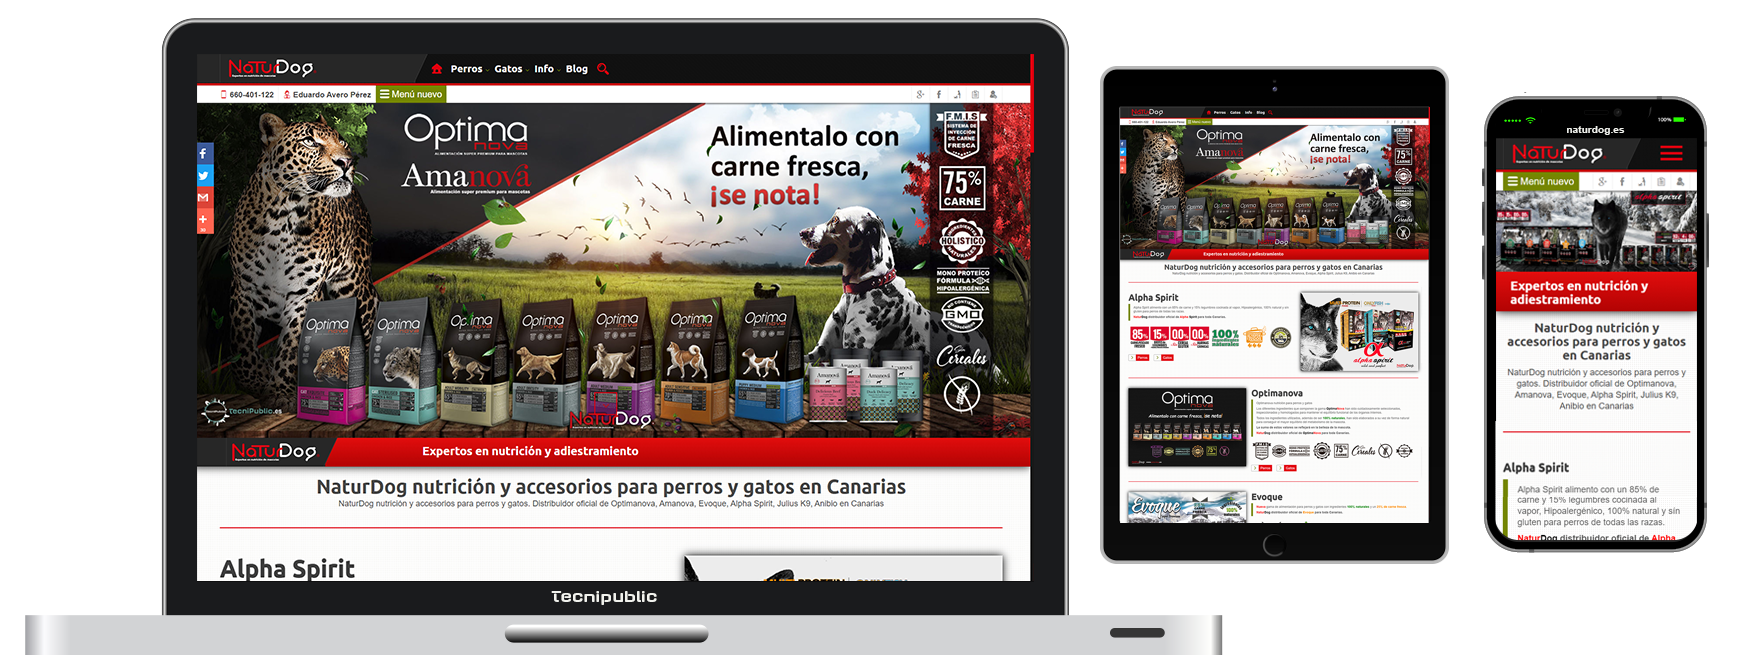 Web diseño fluido para NaturDog - 2015